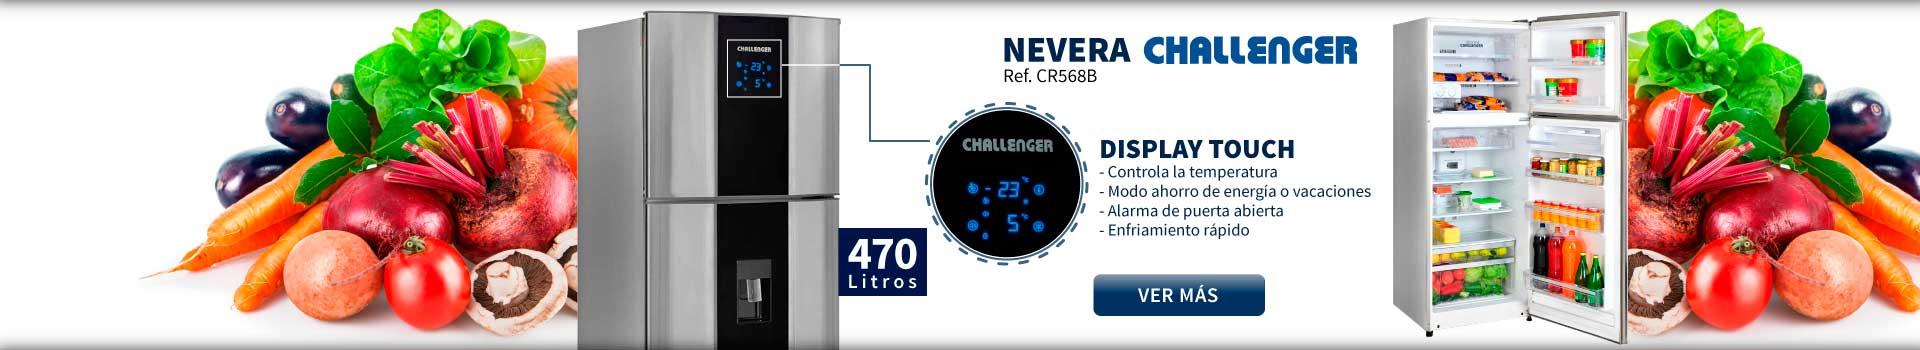 CAT NEV - mayo 23 - NEVERA CHALLENGER CR568B 470 Litros